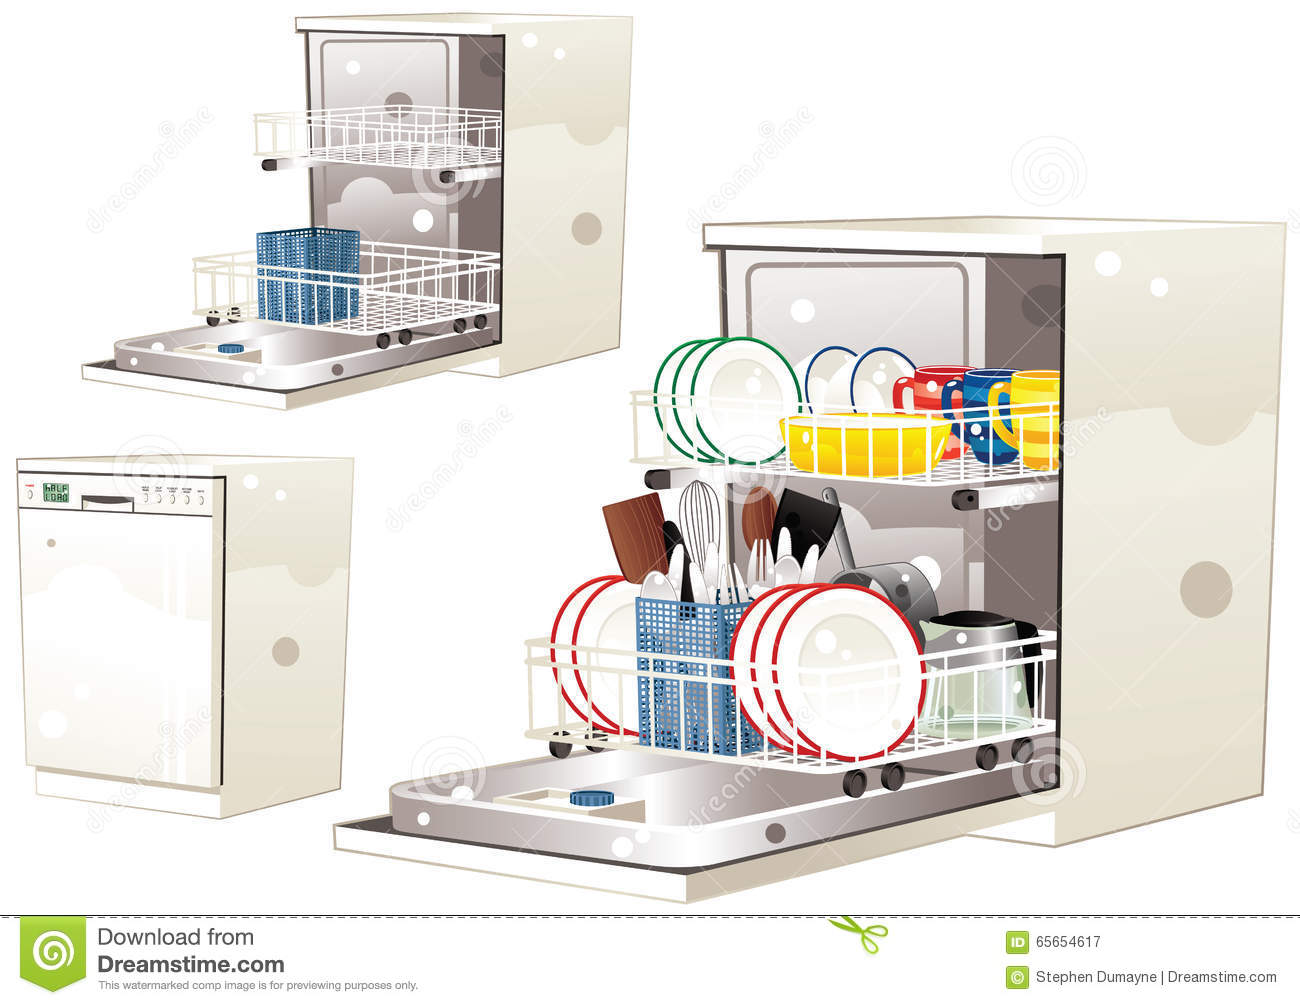 Dishwasher clipart empty dishwasher. Station